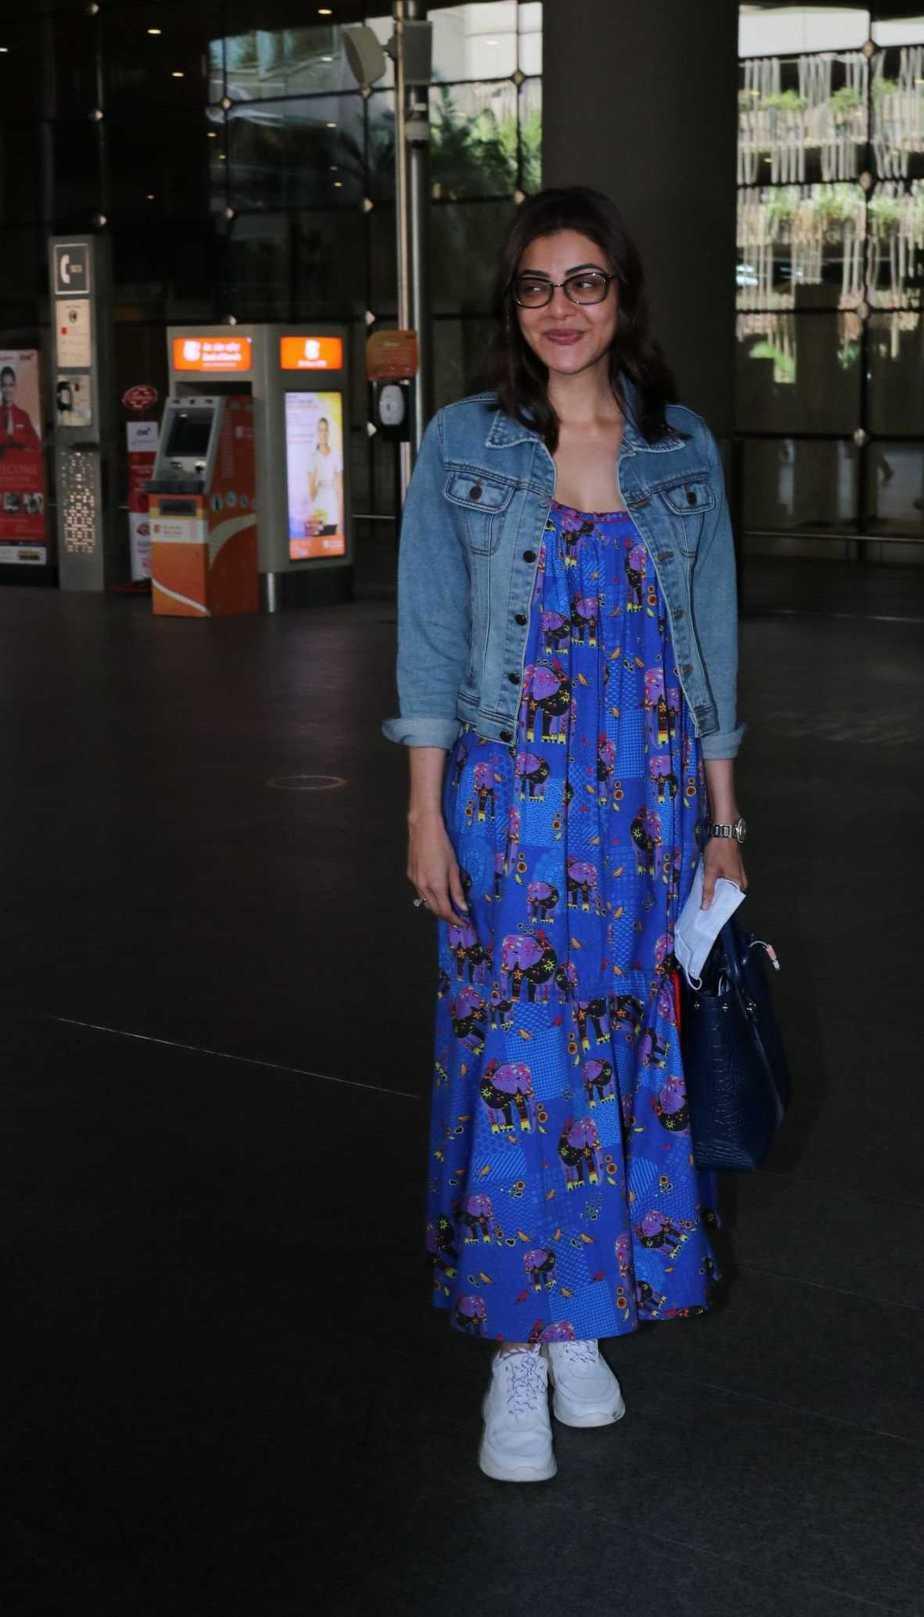 Kajal Aggarwal in a maxi dress by dandelion at mumbai airport1